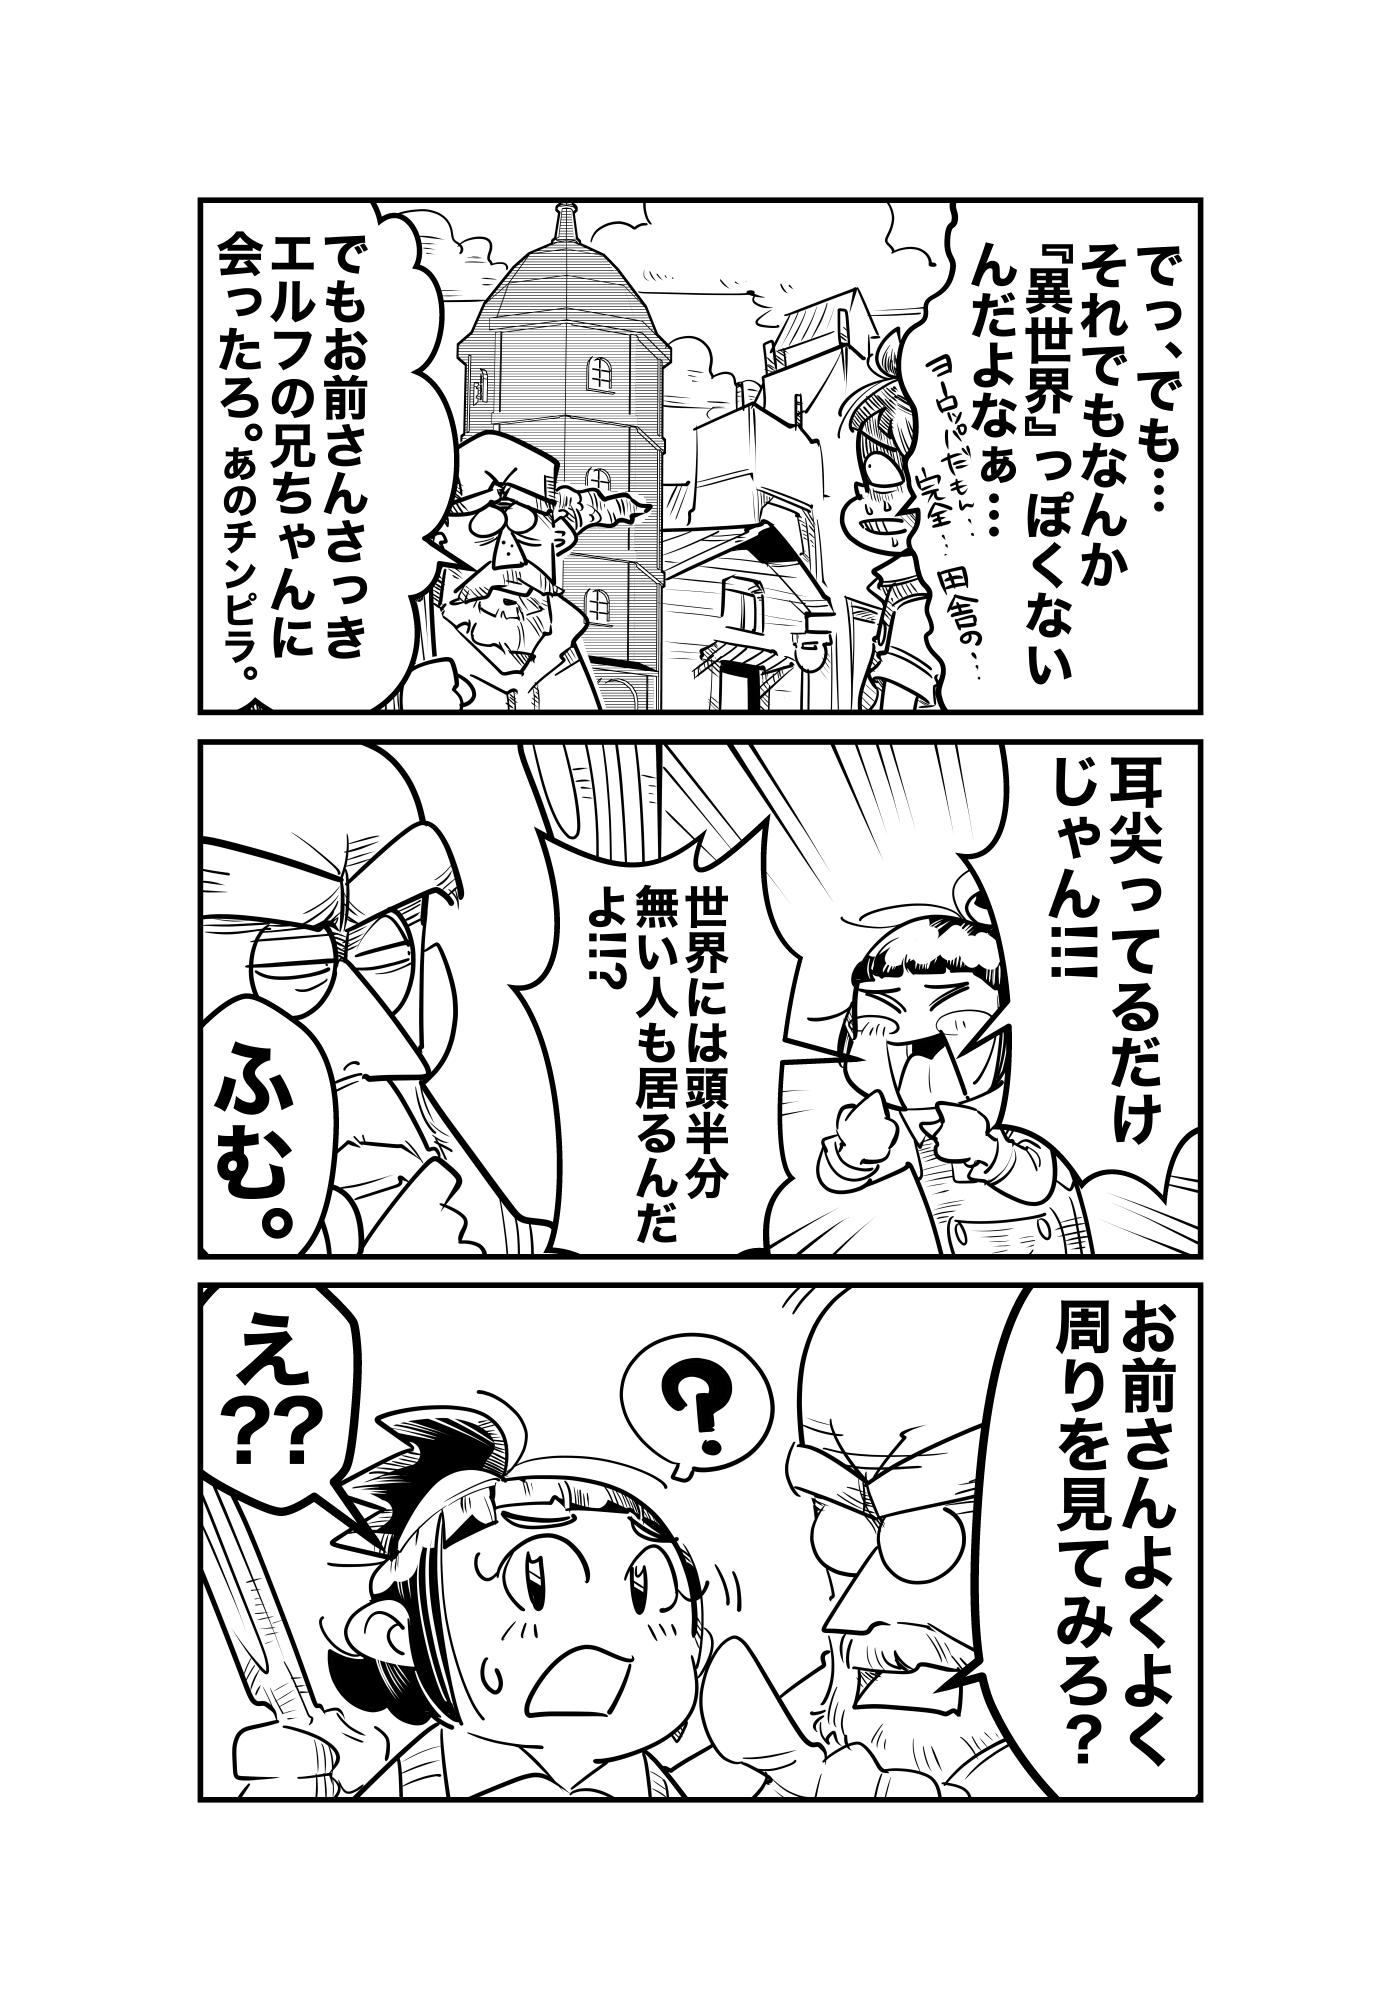 f:id:terashimaru117:20210910131737p:plain